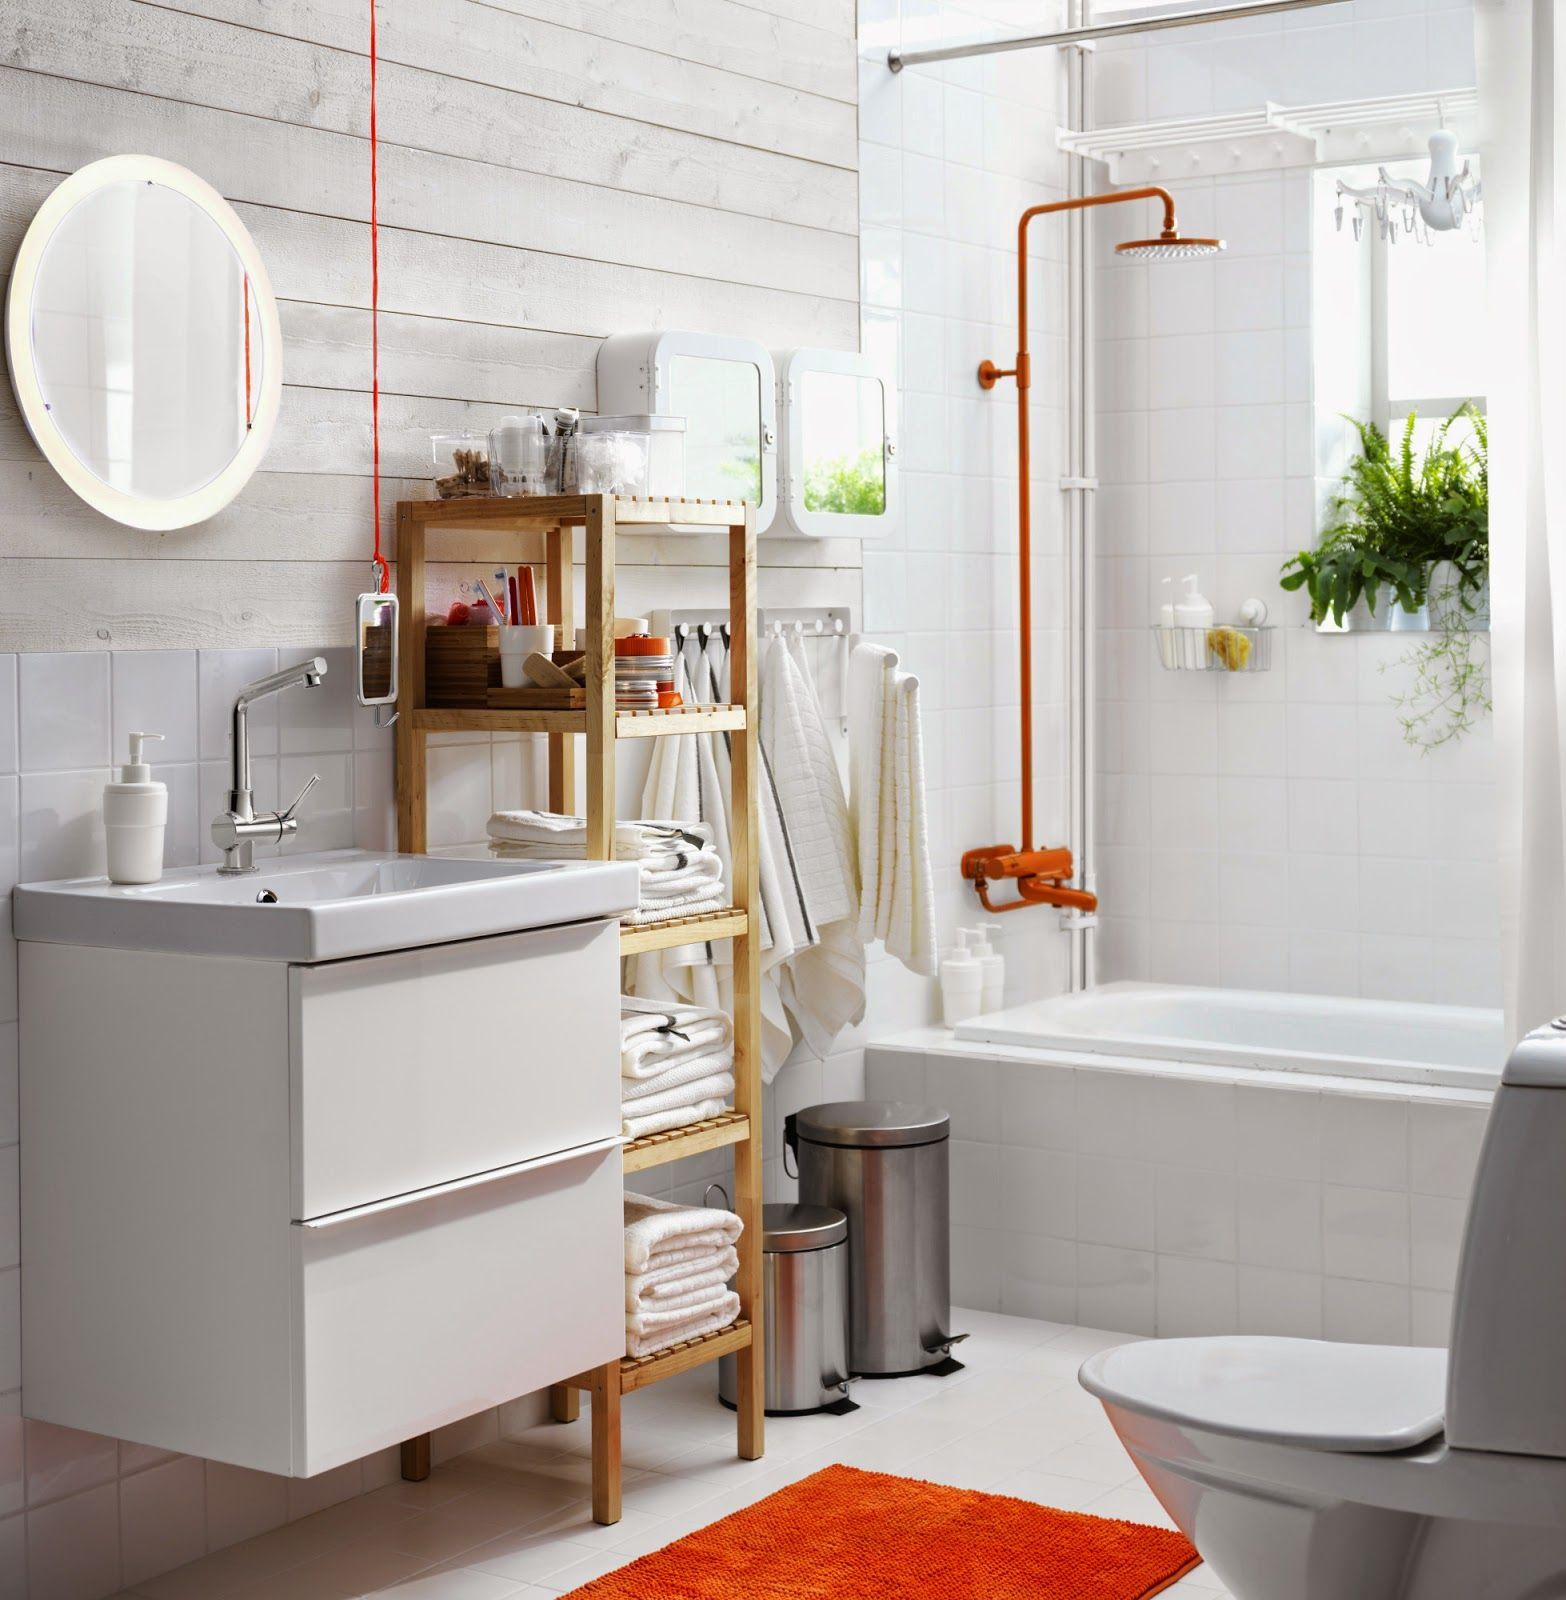 Noul Catalogul Lansat De Ikea Este Disponibil Si Online Jurnal De Design Interior Small Bathroom Renovations Baths Interior Trendy Bathroom